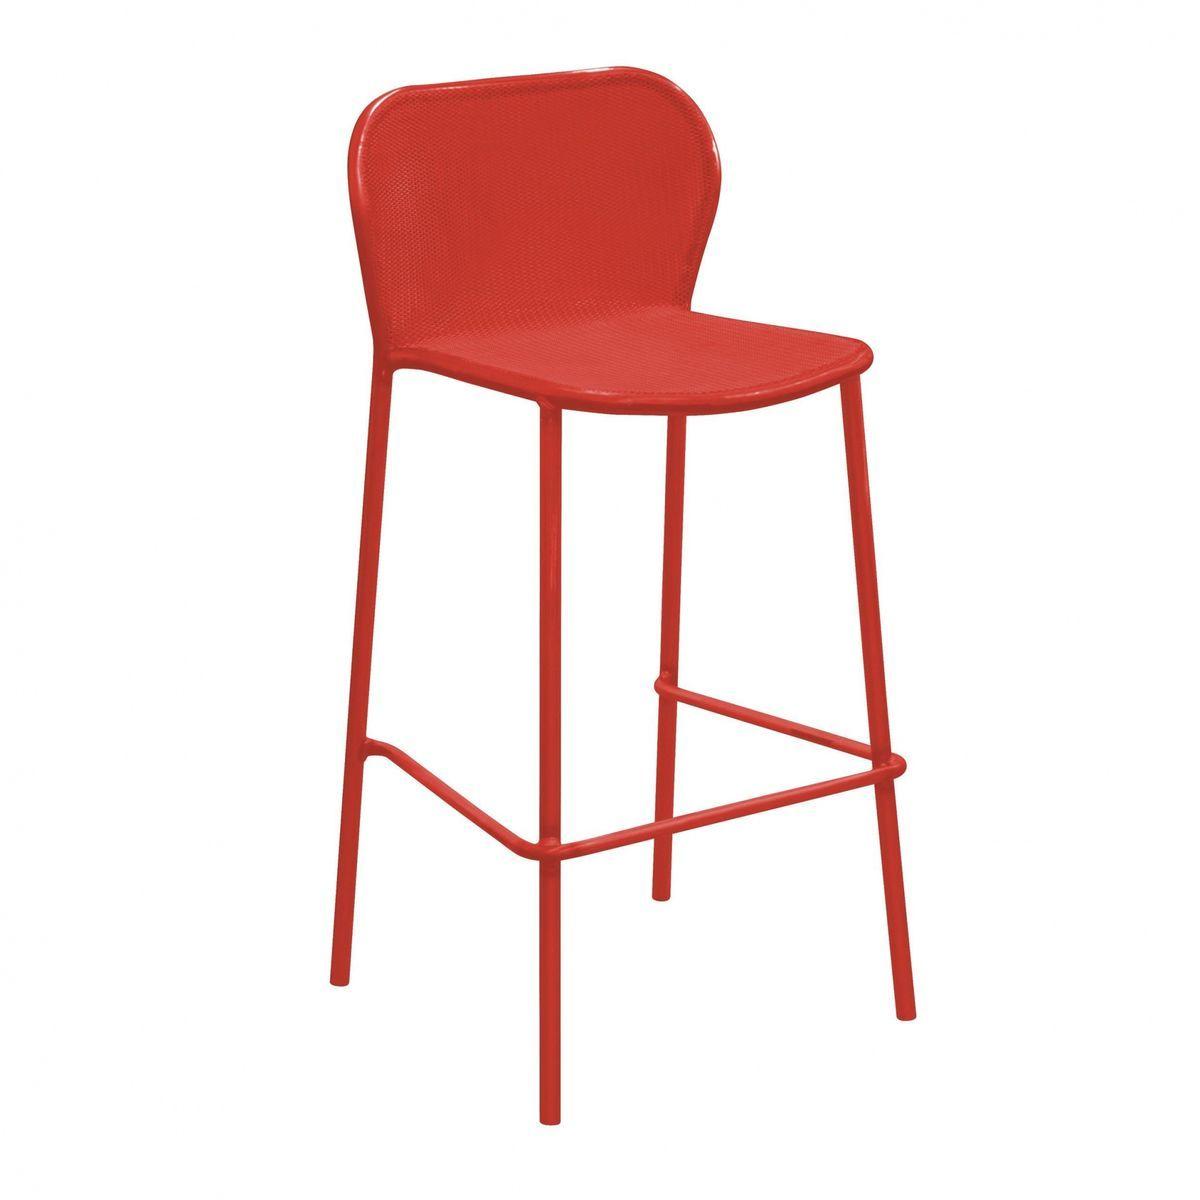 darwin outdoor bar stool cm  emu  ambientedirectcom - emu  darwin outdoor bar stool cm  scarlet red